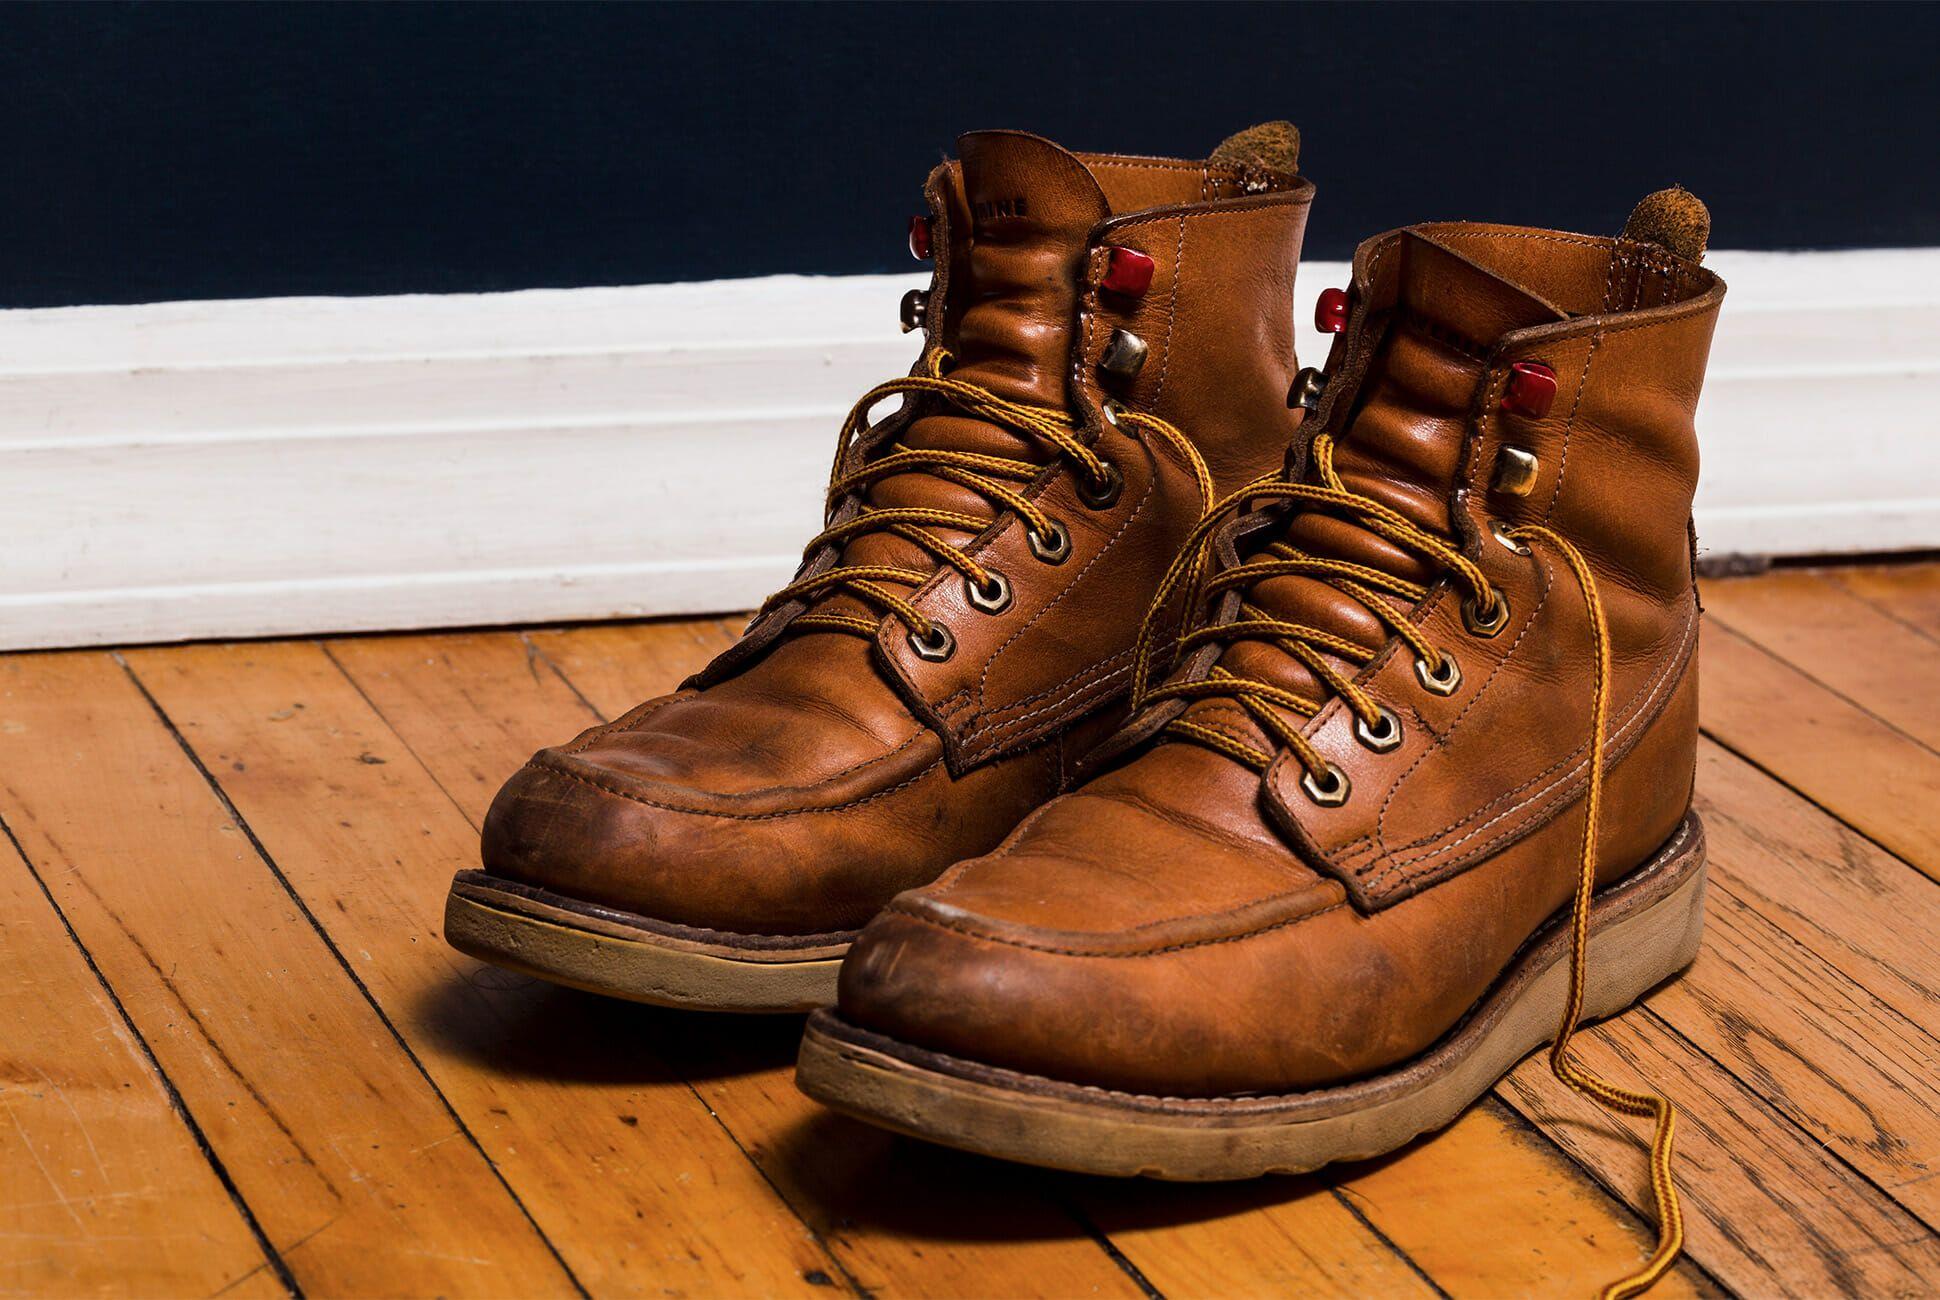 anthony bourdain clarks desert boots